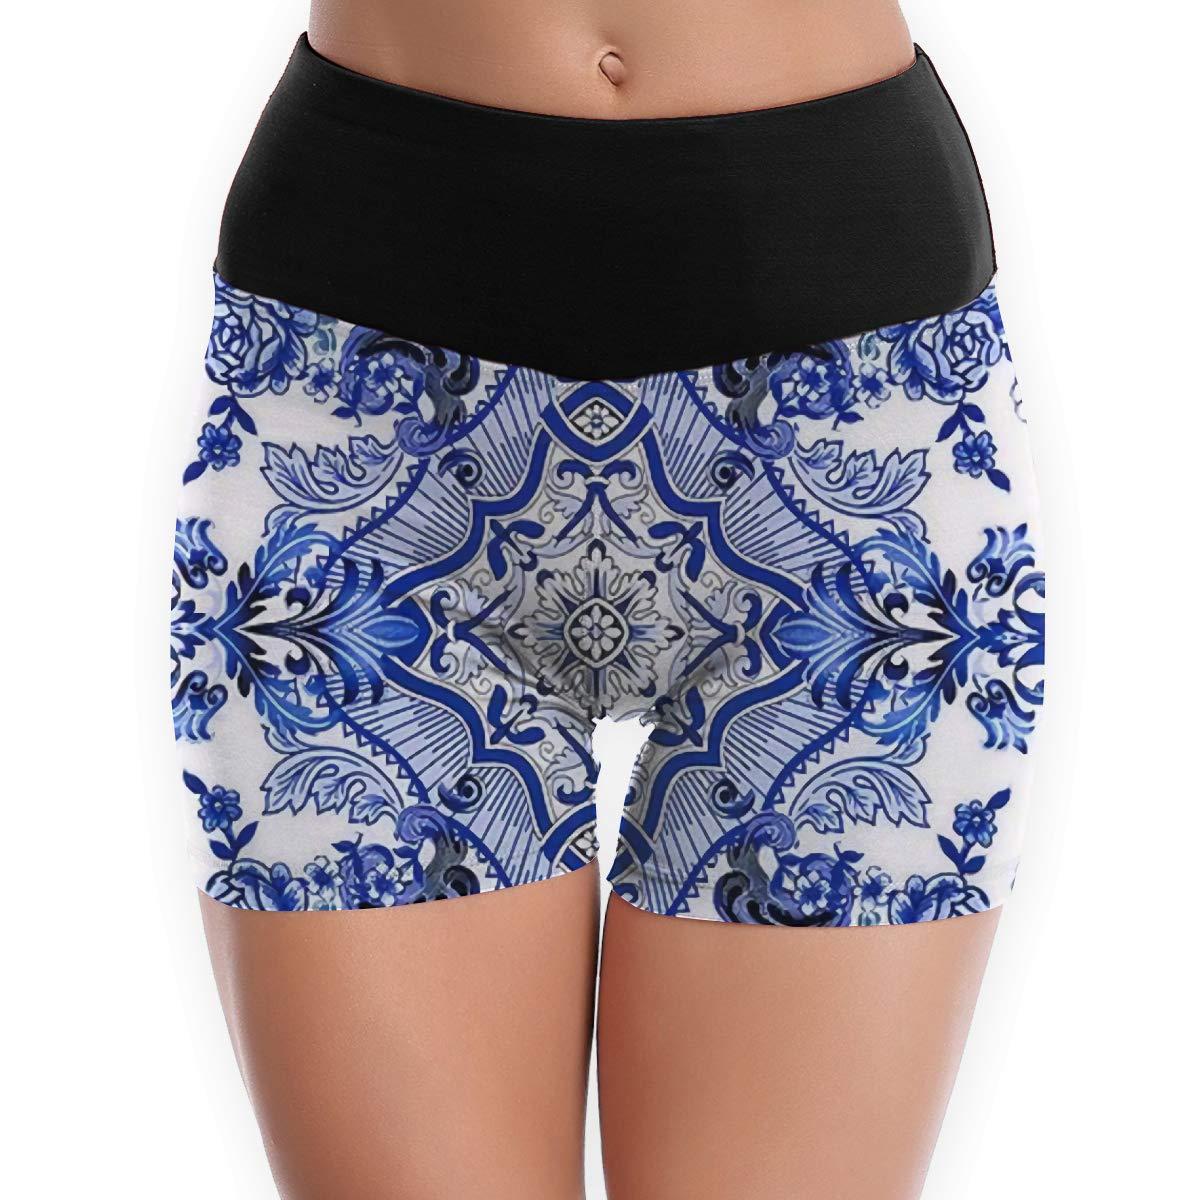 NBXIXI Chinese Blue and White Flowers Graphic High Waist Yoga Shorts for Women Girls Tummy Control Capri